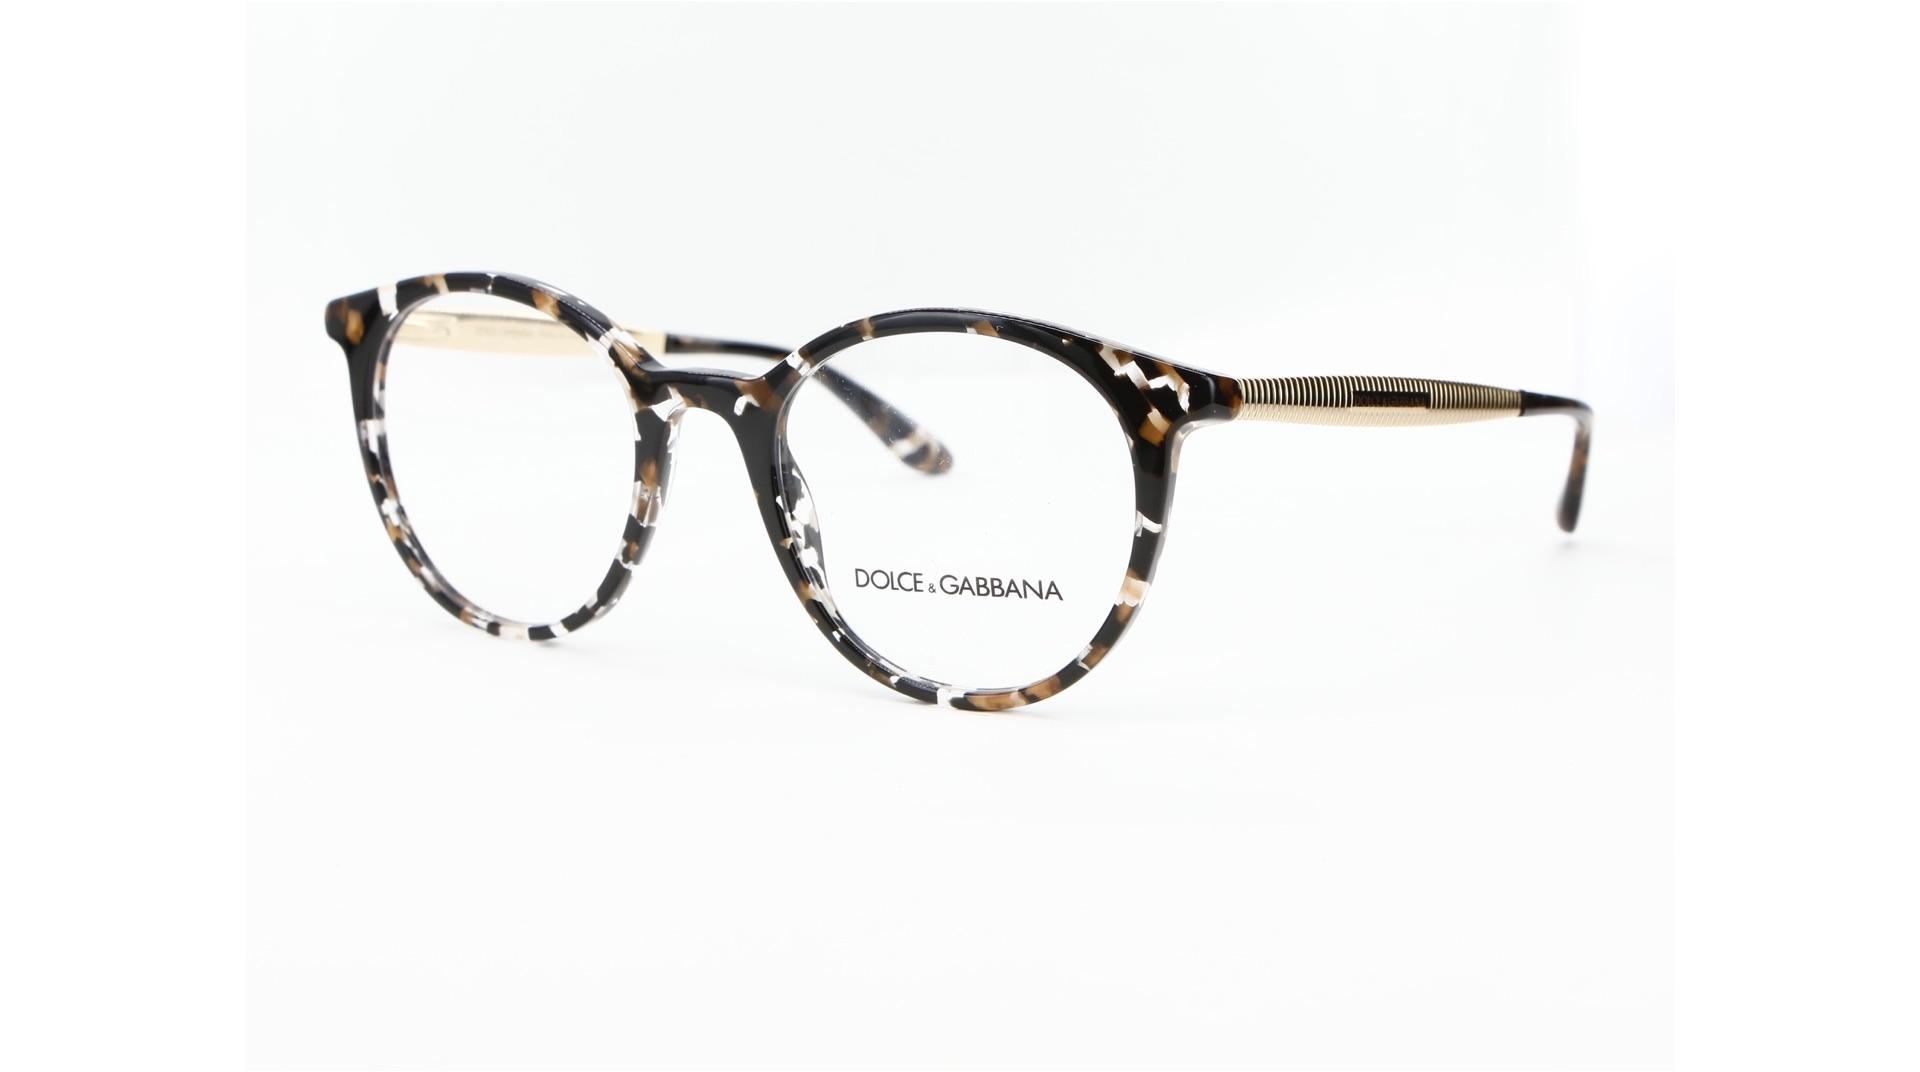 Dolce & Gabbana - ref: 80753